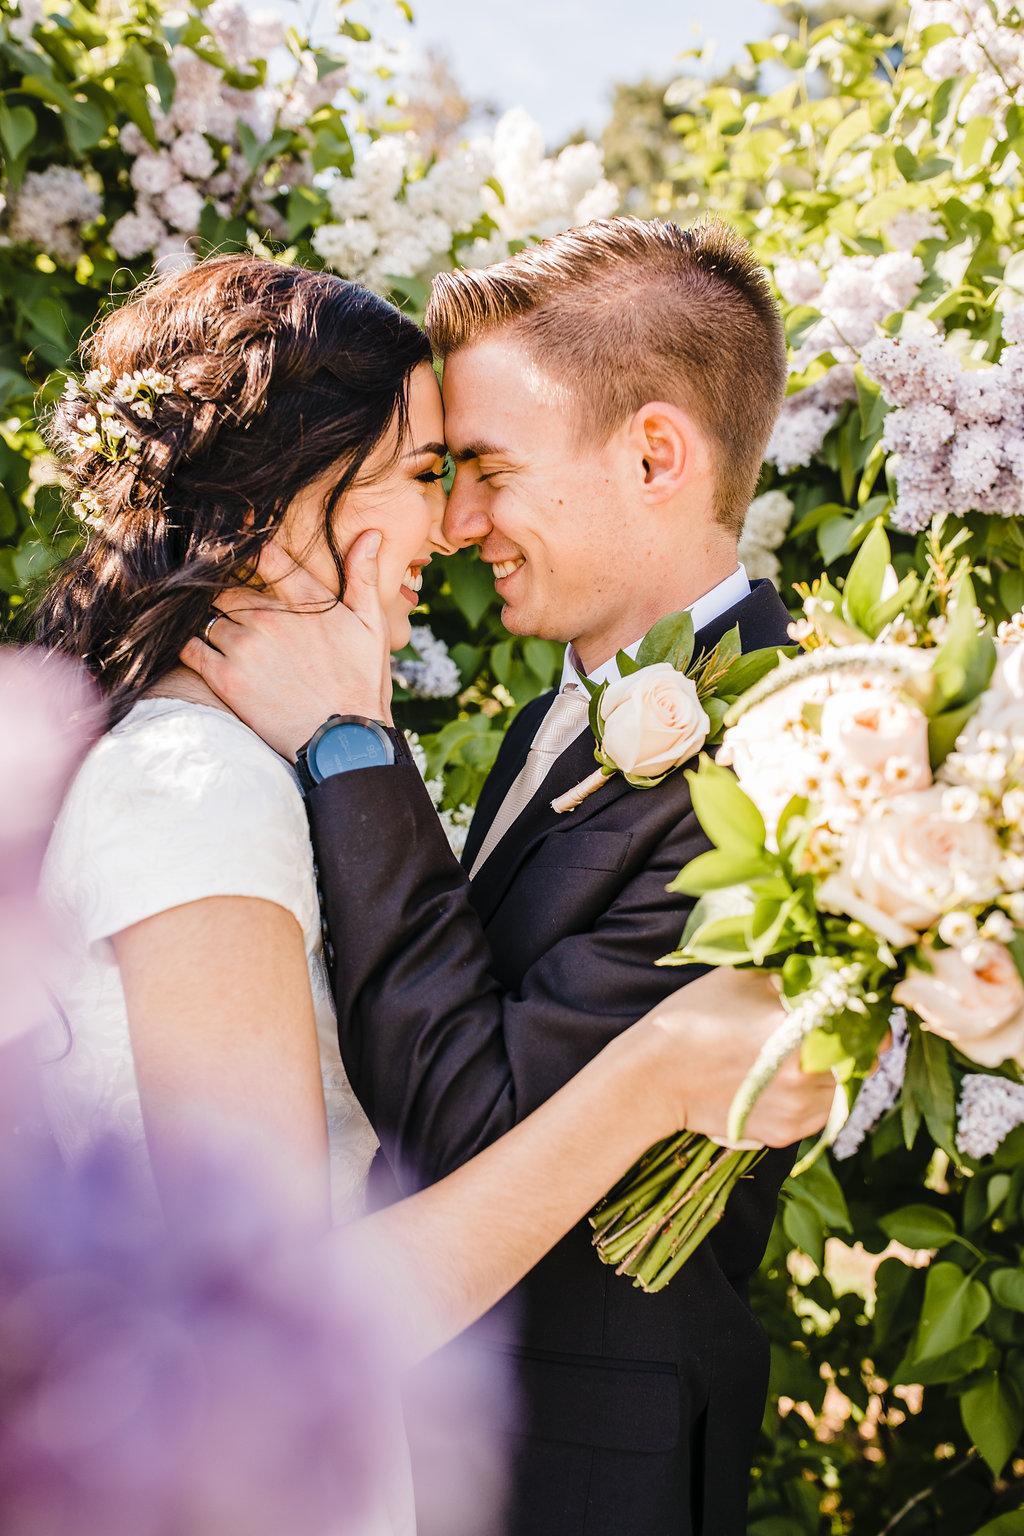 wedding day photographer professional wedding photography salt lake city utah calli richards